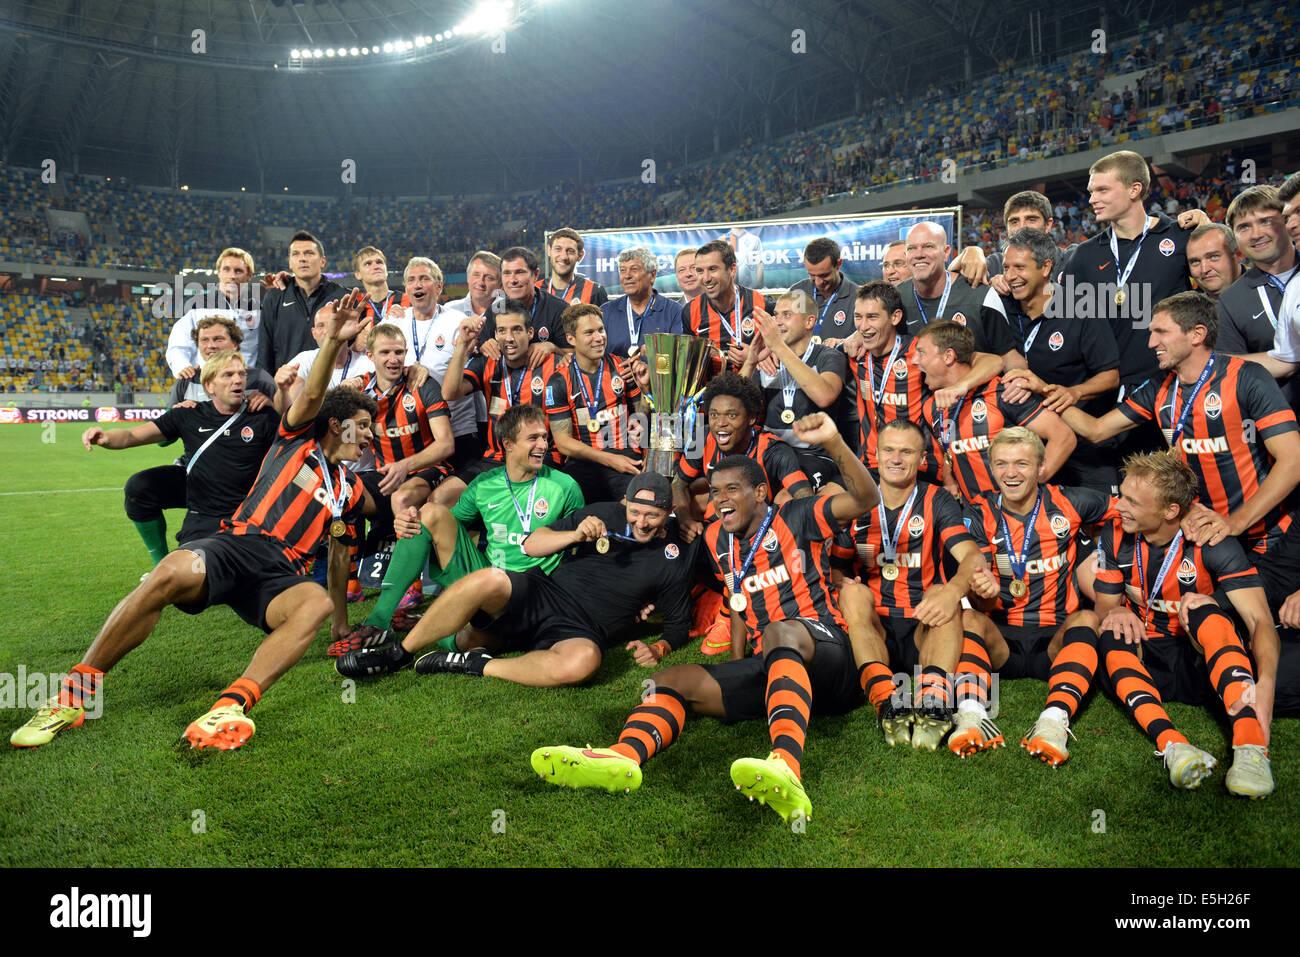 Shakhtar football team during the match Inter between 'Shakhtar' (Donetsk City) and Dynamo (Kyiv) at Stadium - Stock Image